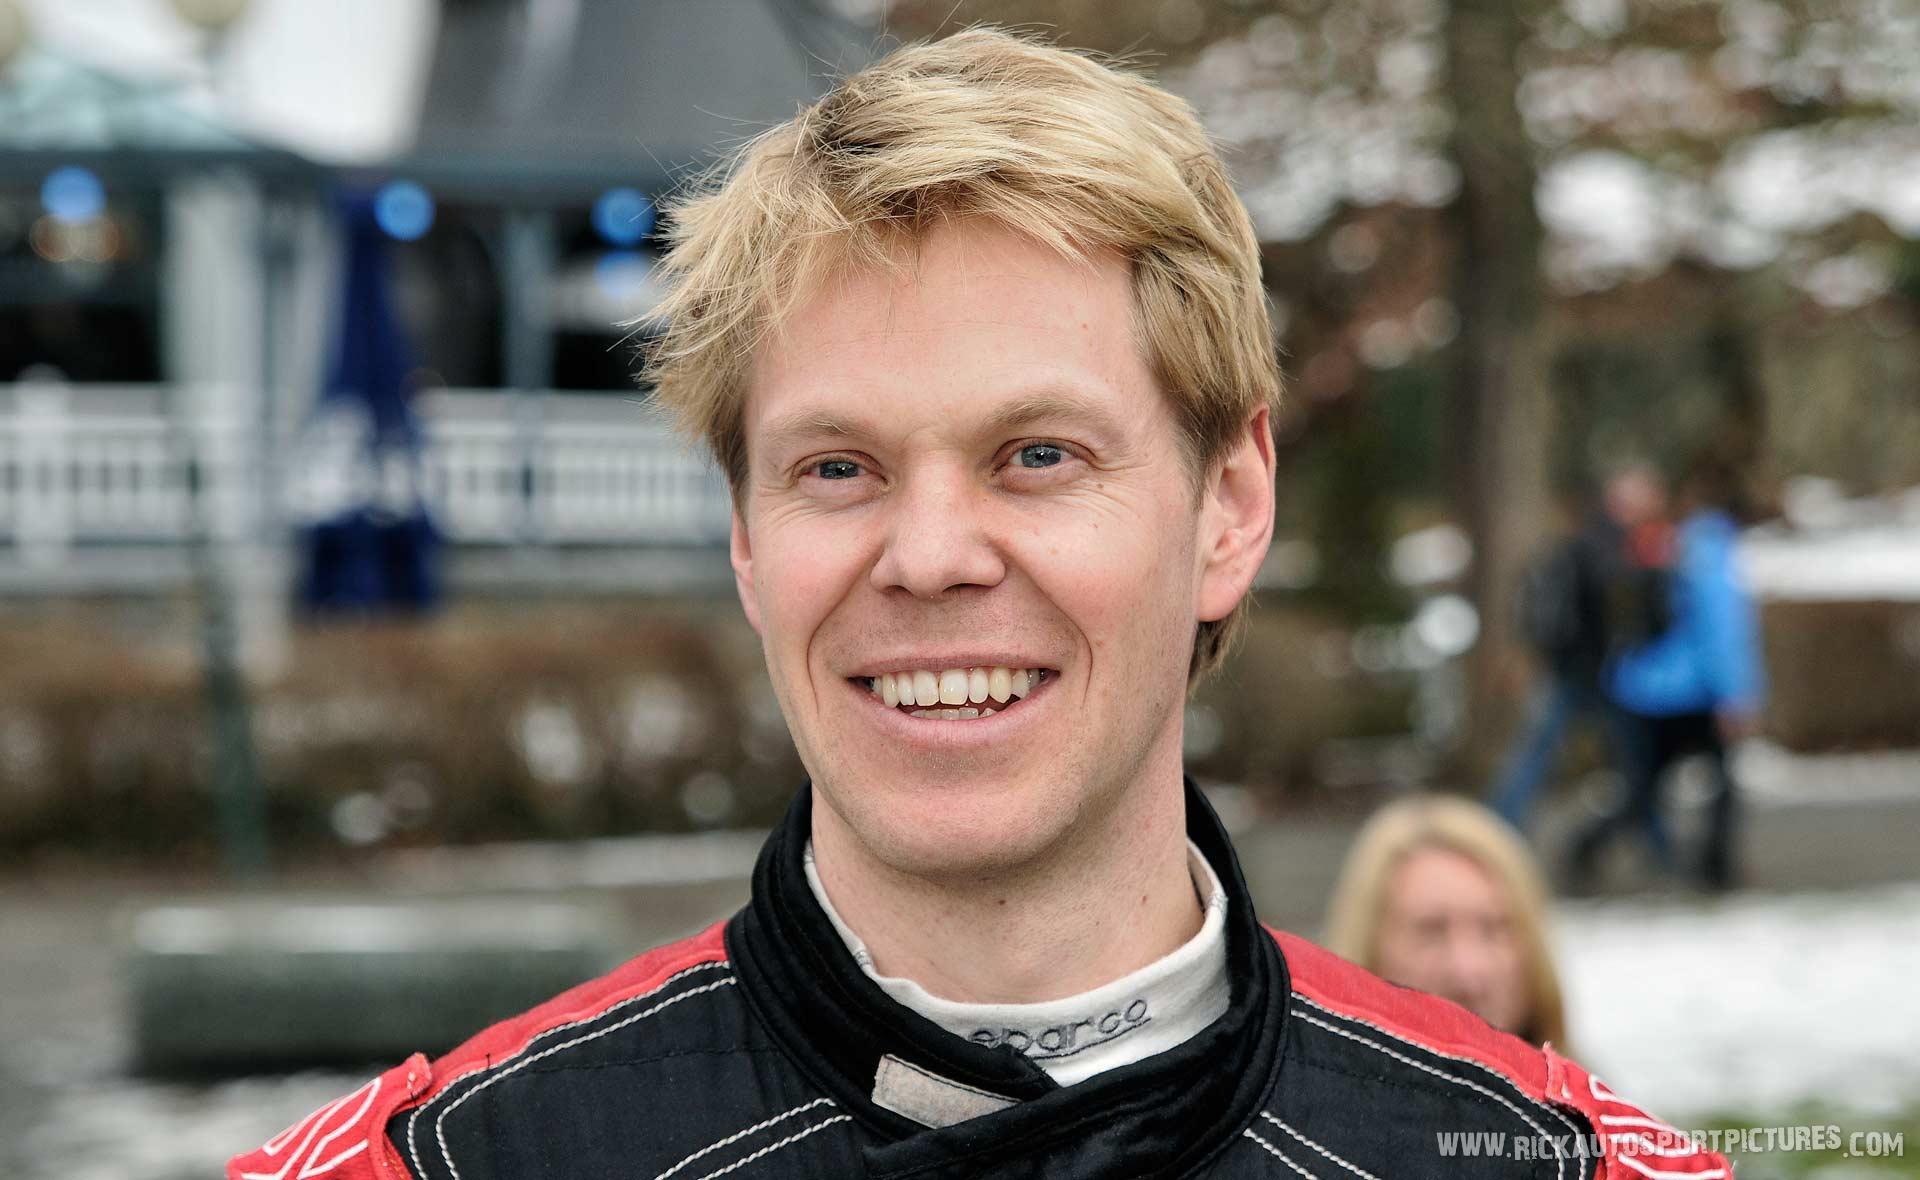 Per-Gunnar Andersson legend boucles spa 2013